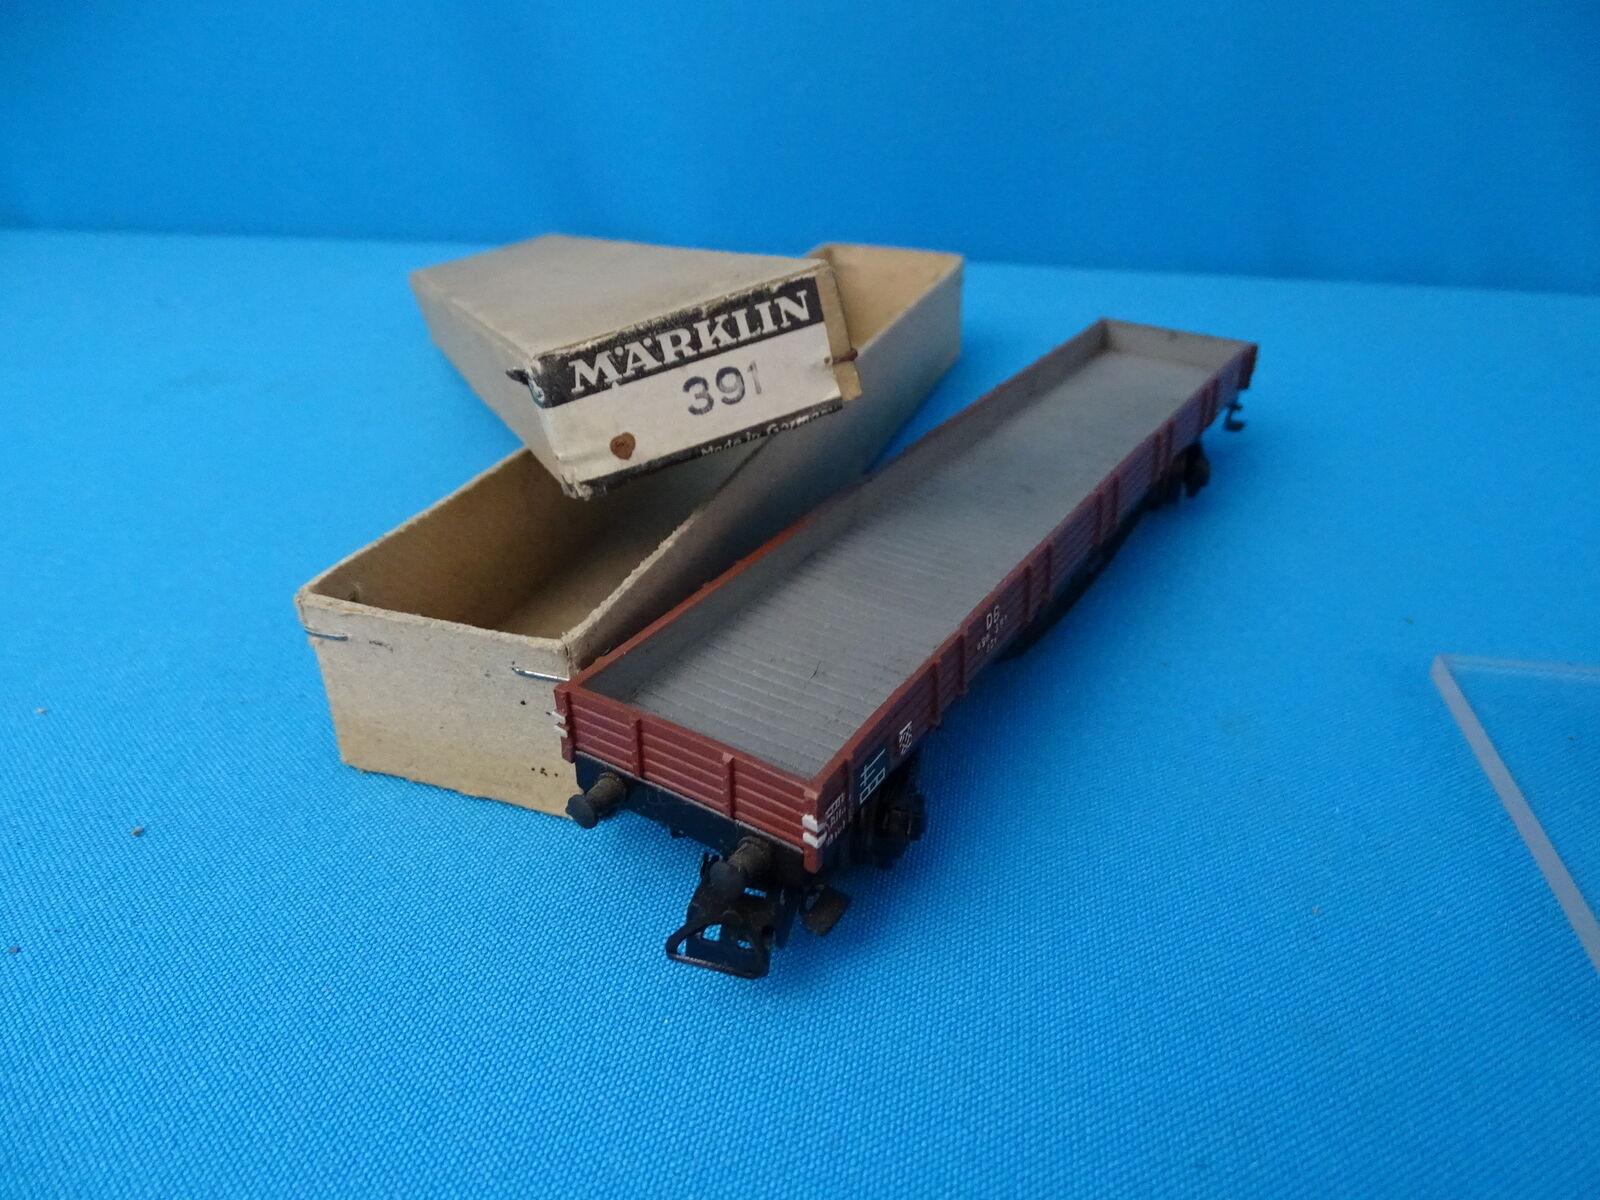 Marklin 391 DB Large 4 axled flat car Tin plate vers. 8 in OVP